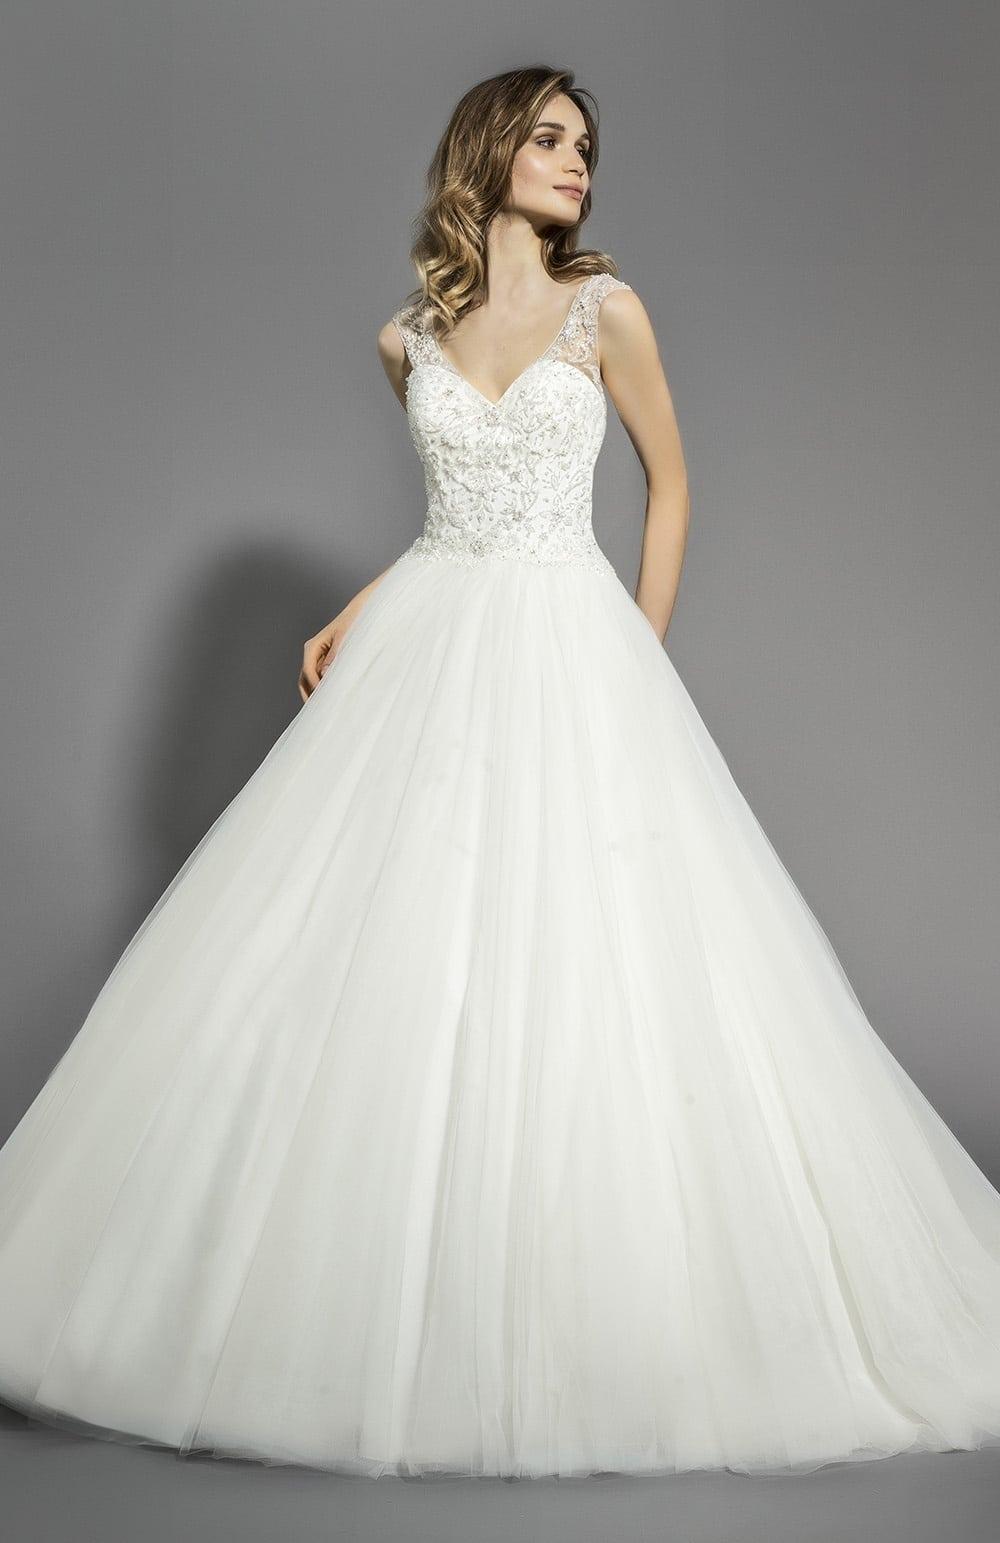 Robe de mariée Modèle Madina